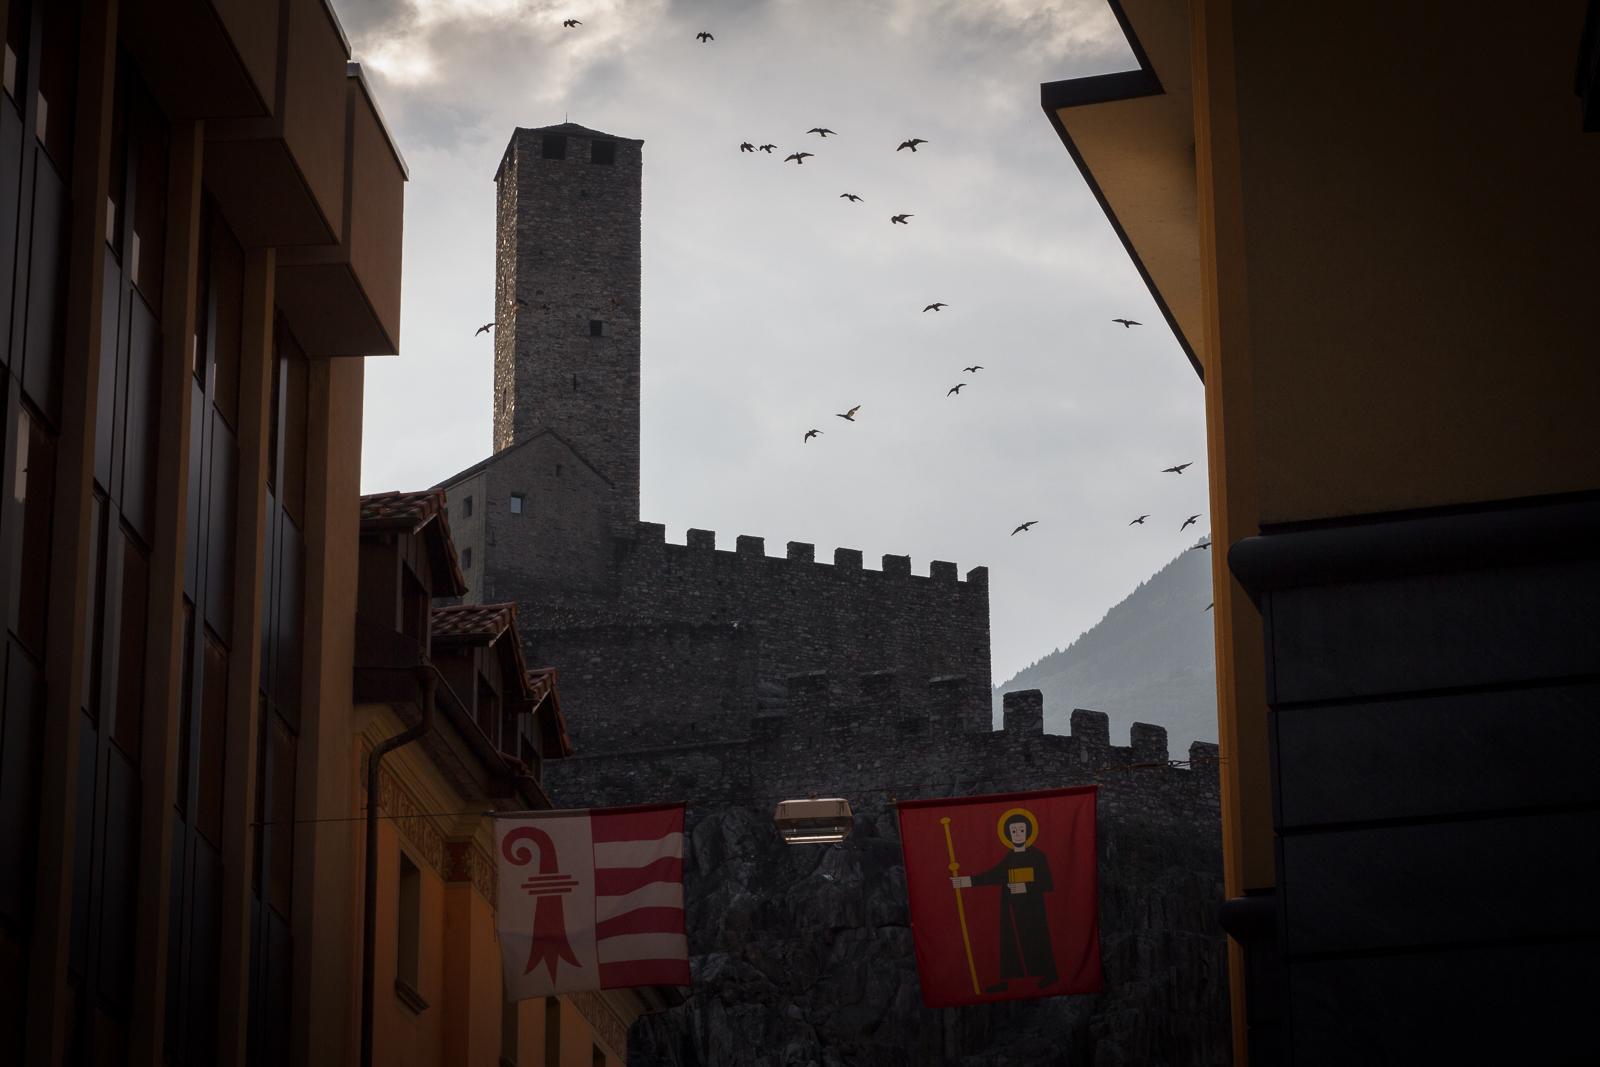 Castelgrande as seen from downtown